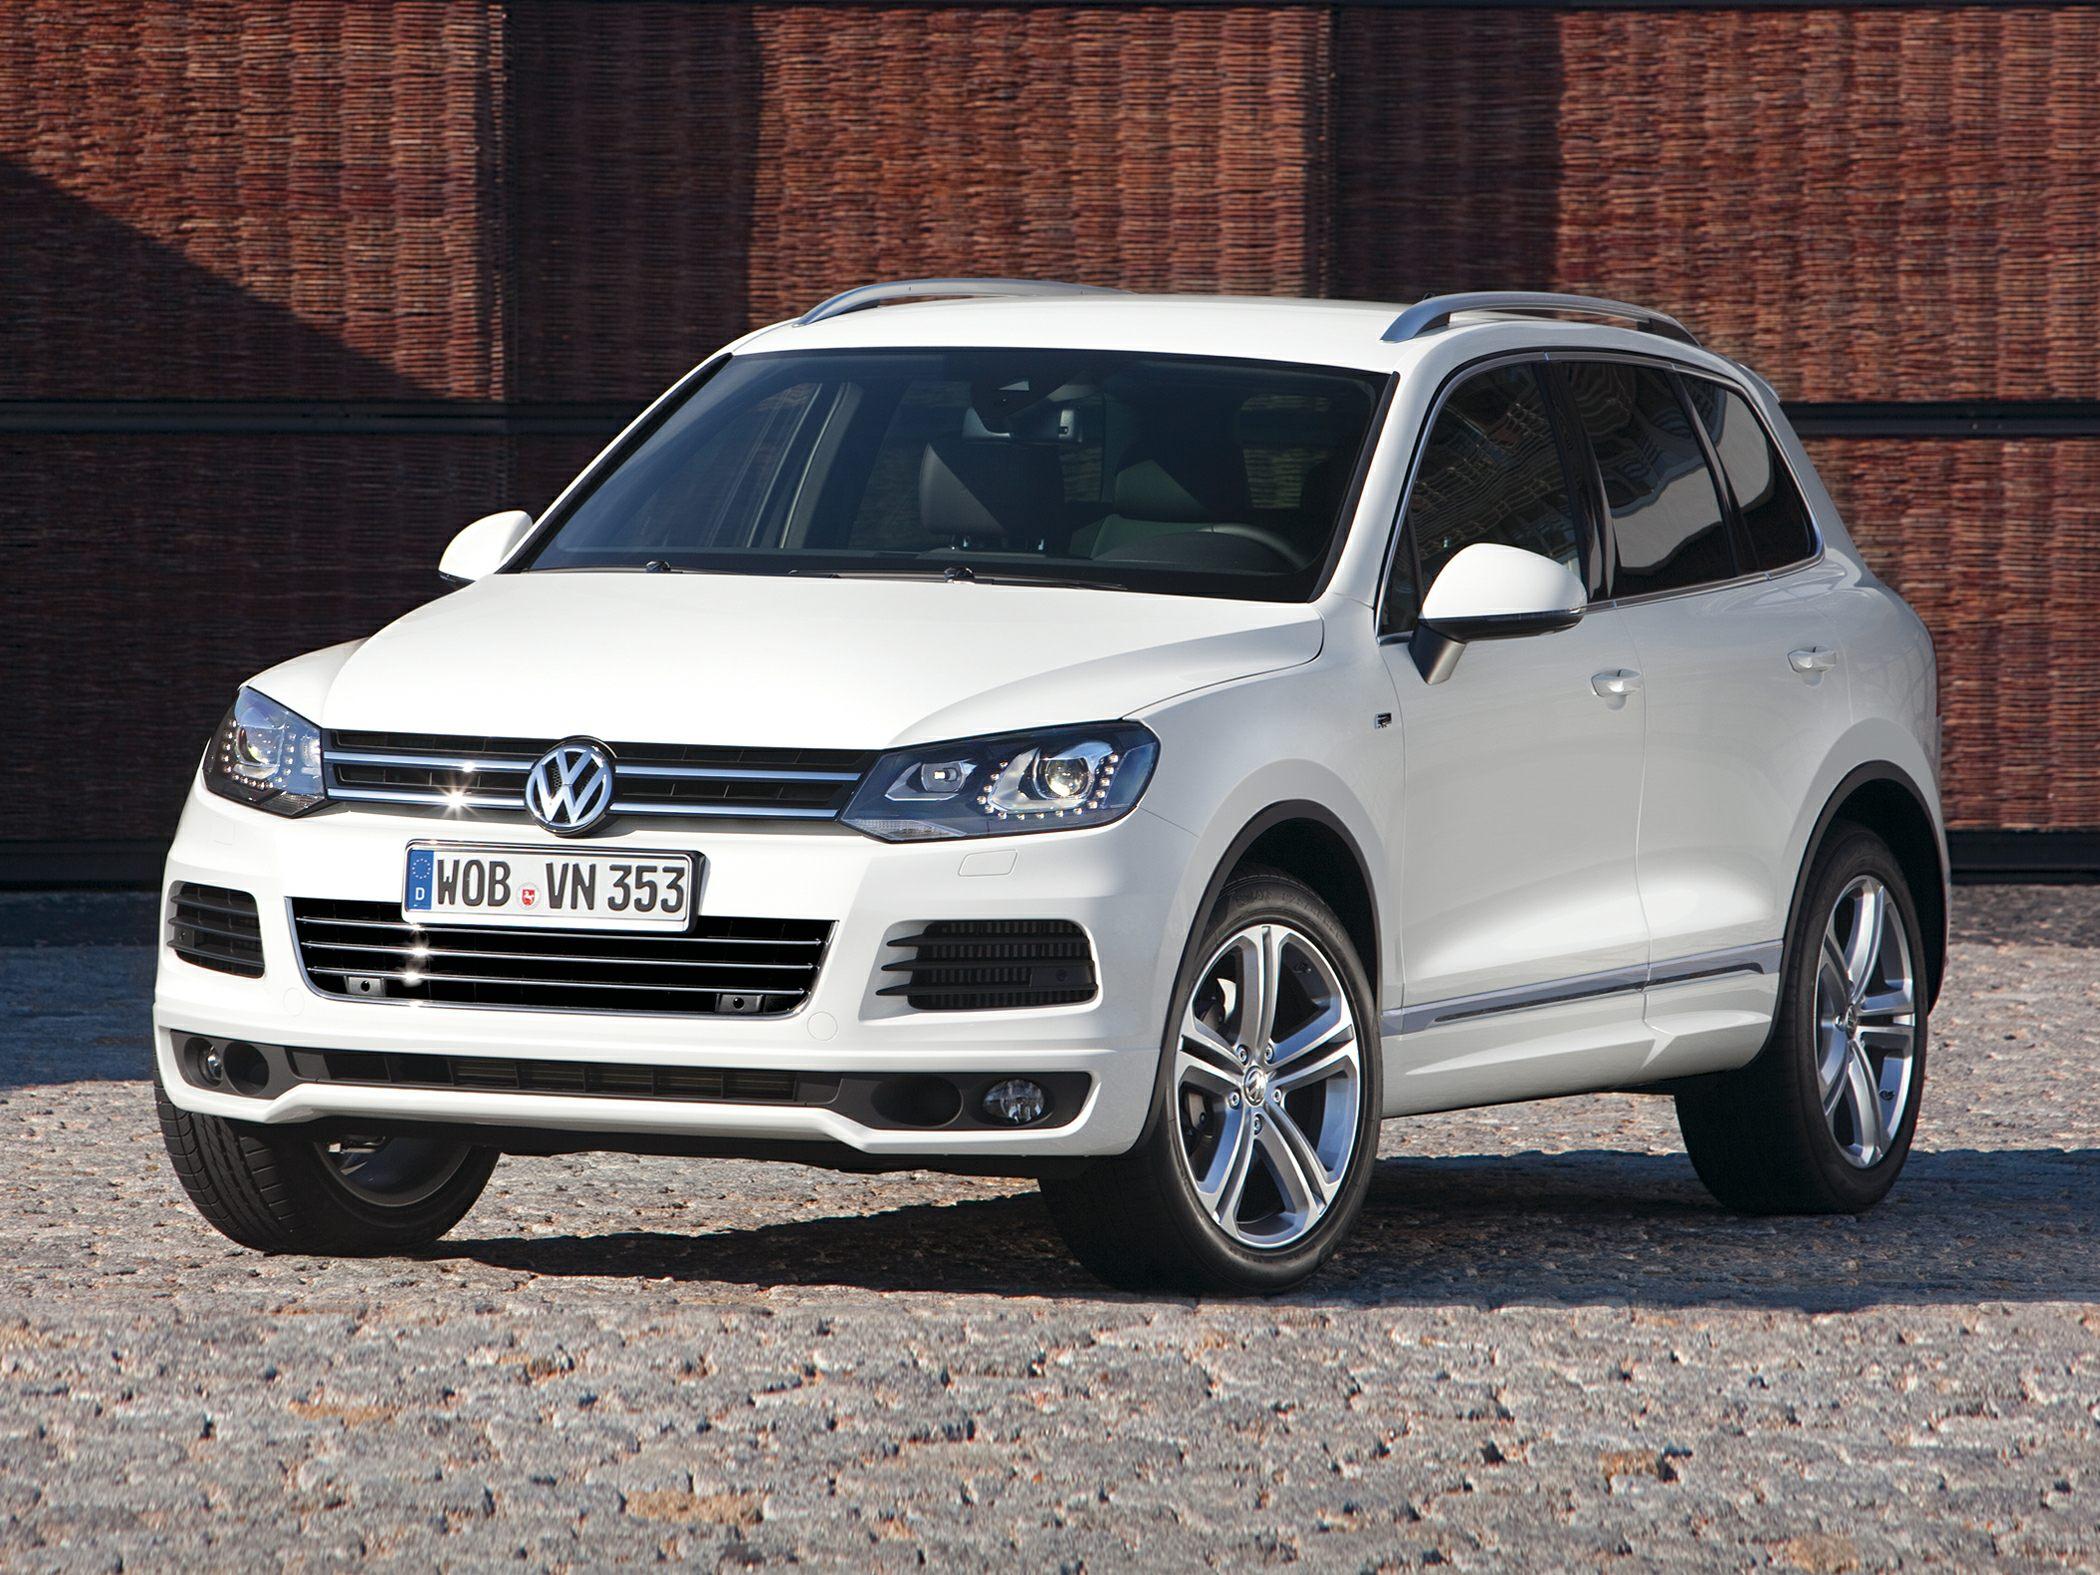 2014 Volkswagen Touareg Glam